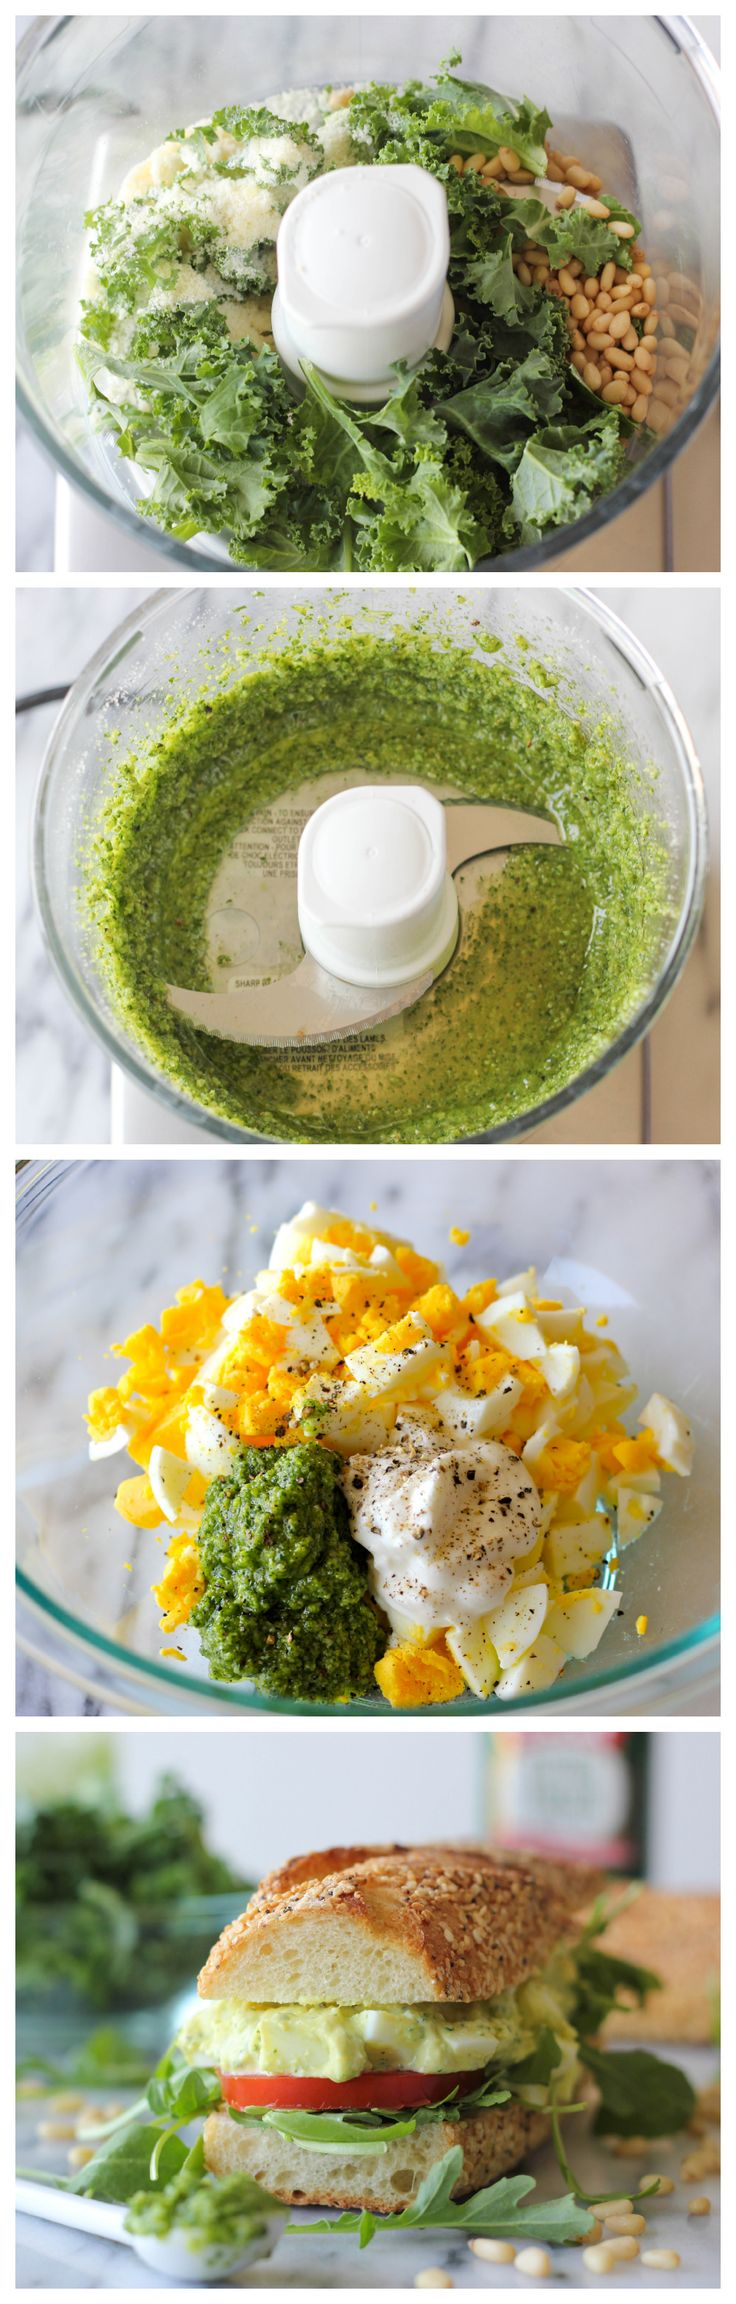 Kale Pesto Egg Salad @Stephanie Close Bailey